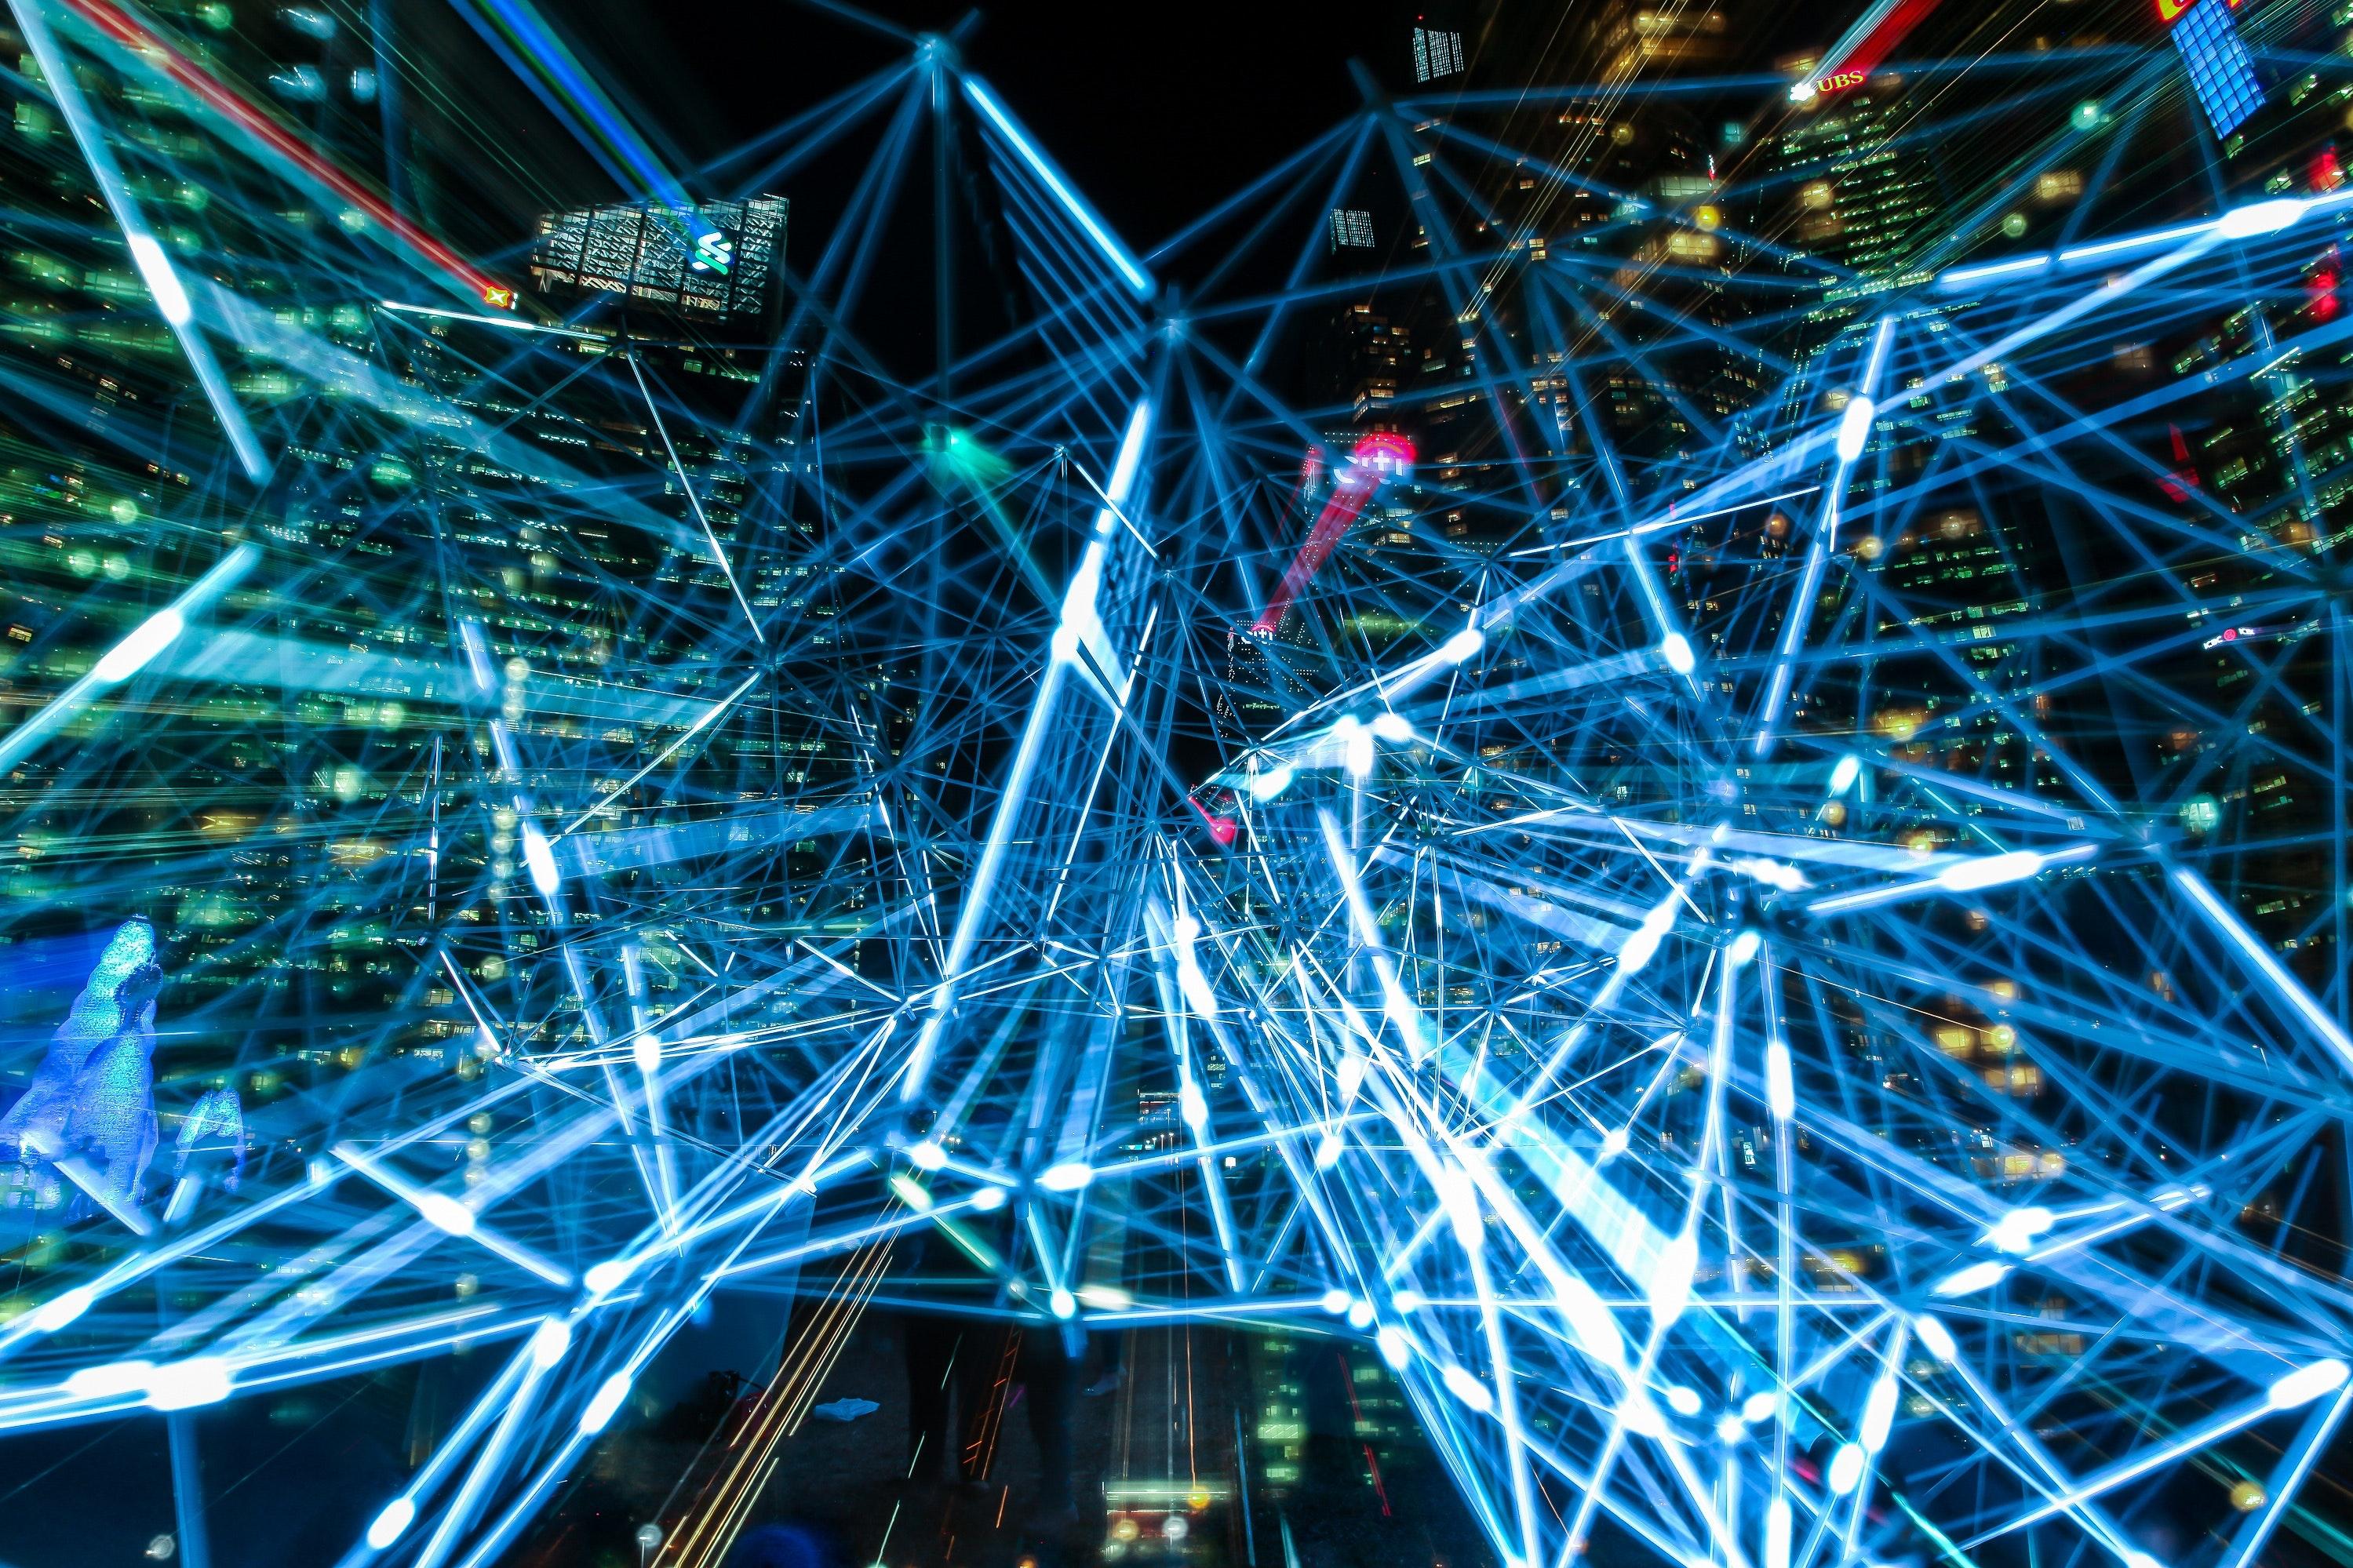 art-big-data-blur-373543.jpg